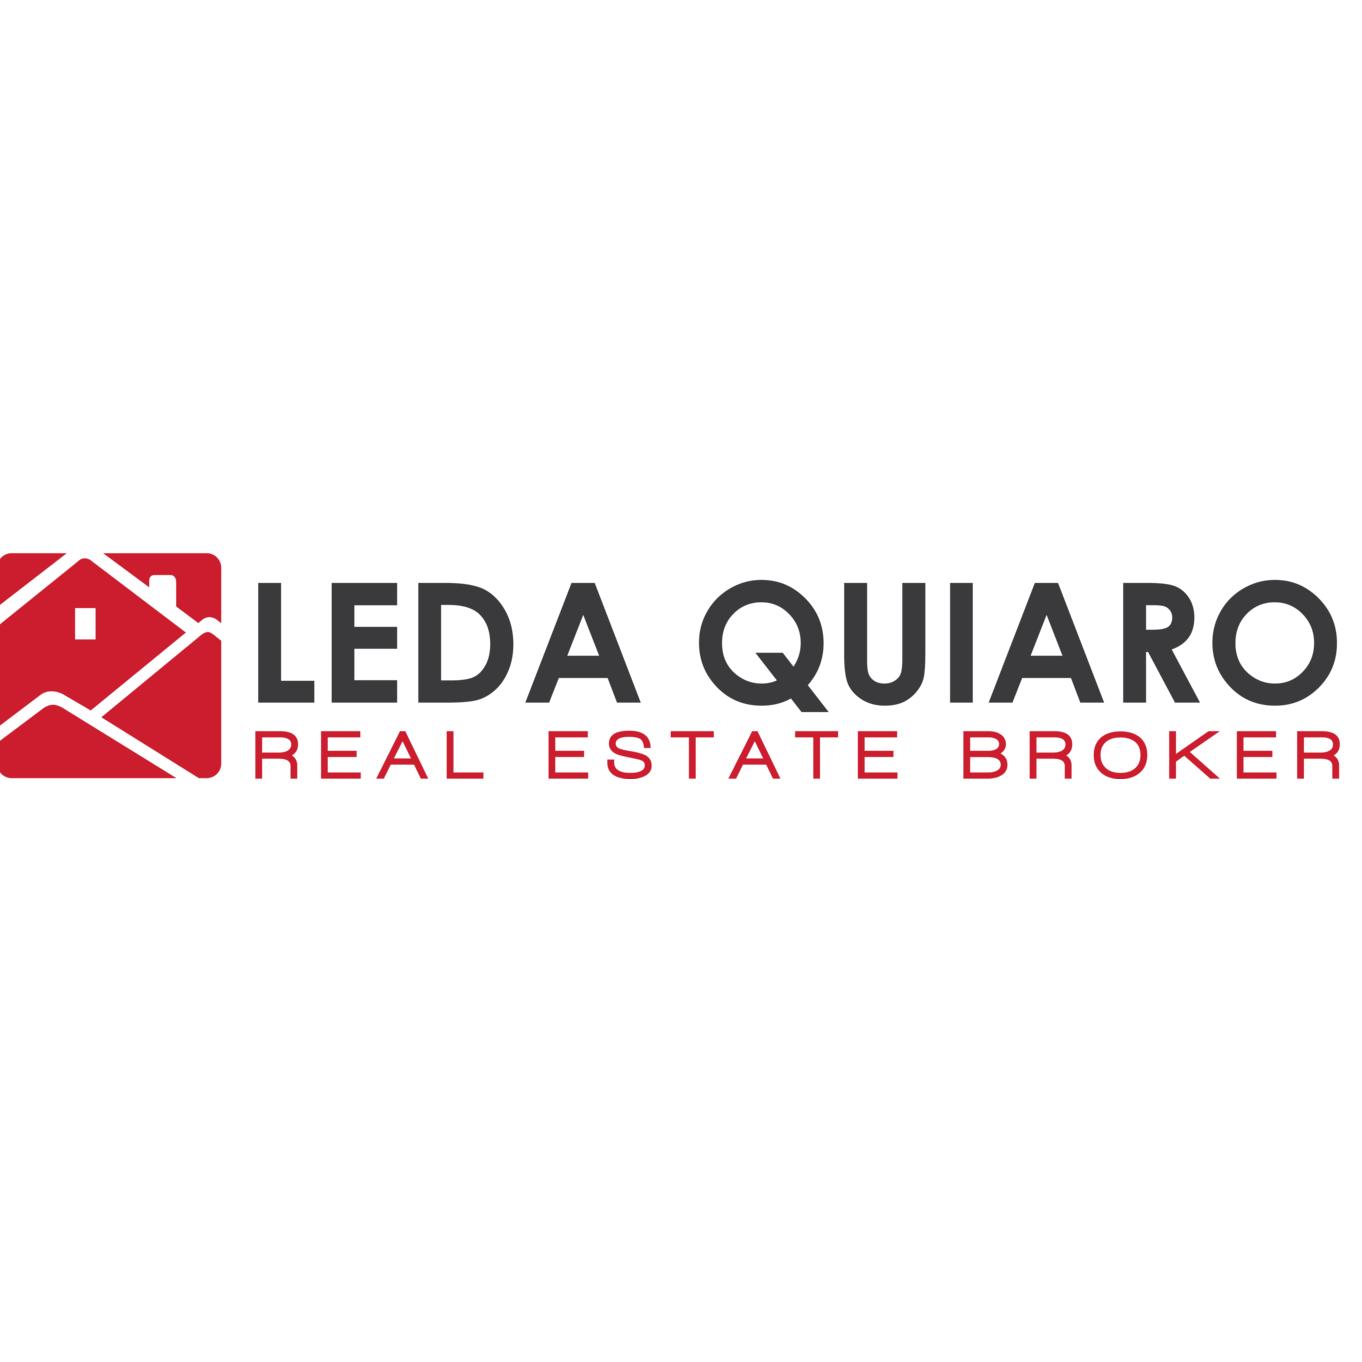 Leda Quiaro | Charles Rutenberg Realty